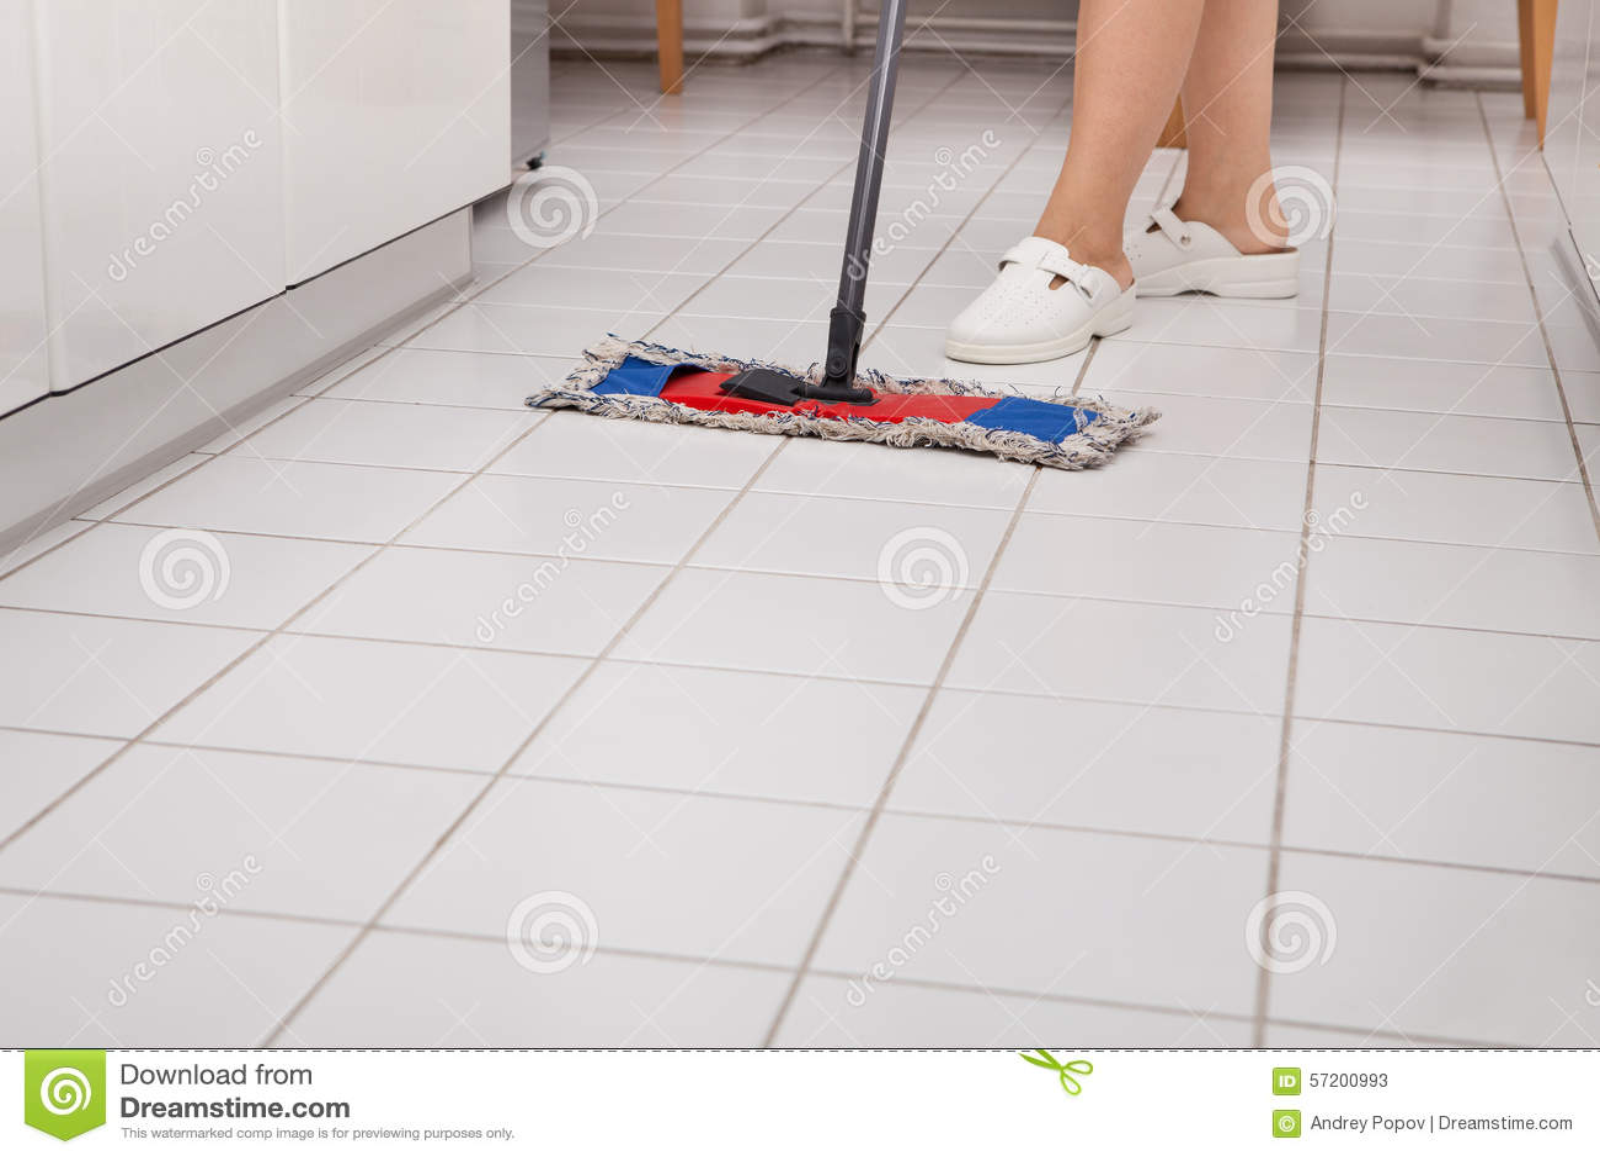 cleaning kitchen floors cupboards for 年轻佣人清洁厨房地板库存图片 图片包括有行业 笤帚 手工 白种人 年轻佣人清洁厨房地板